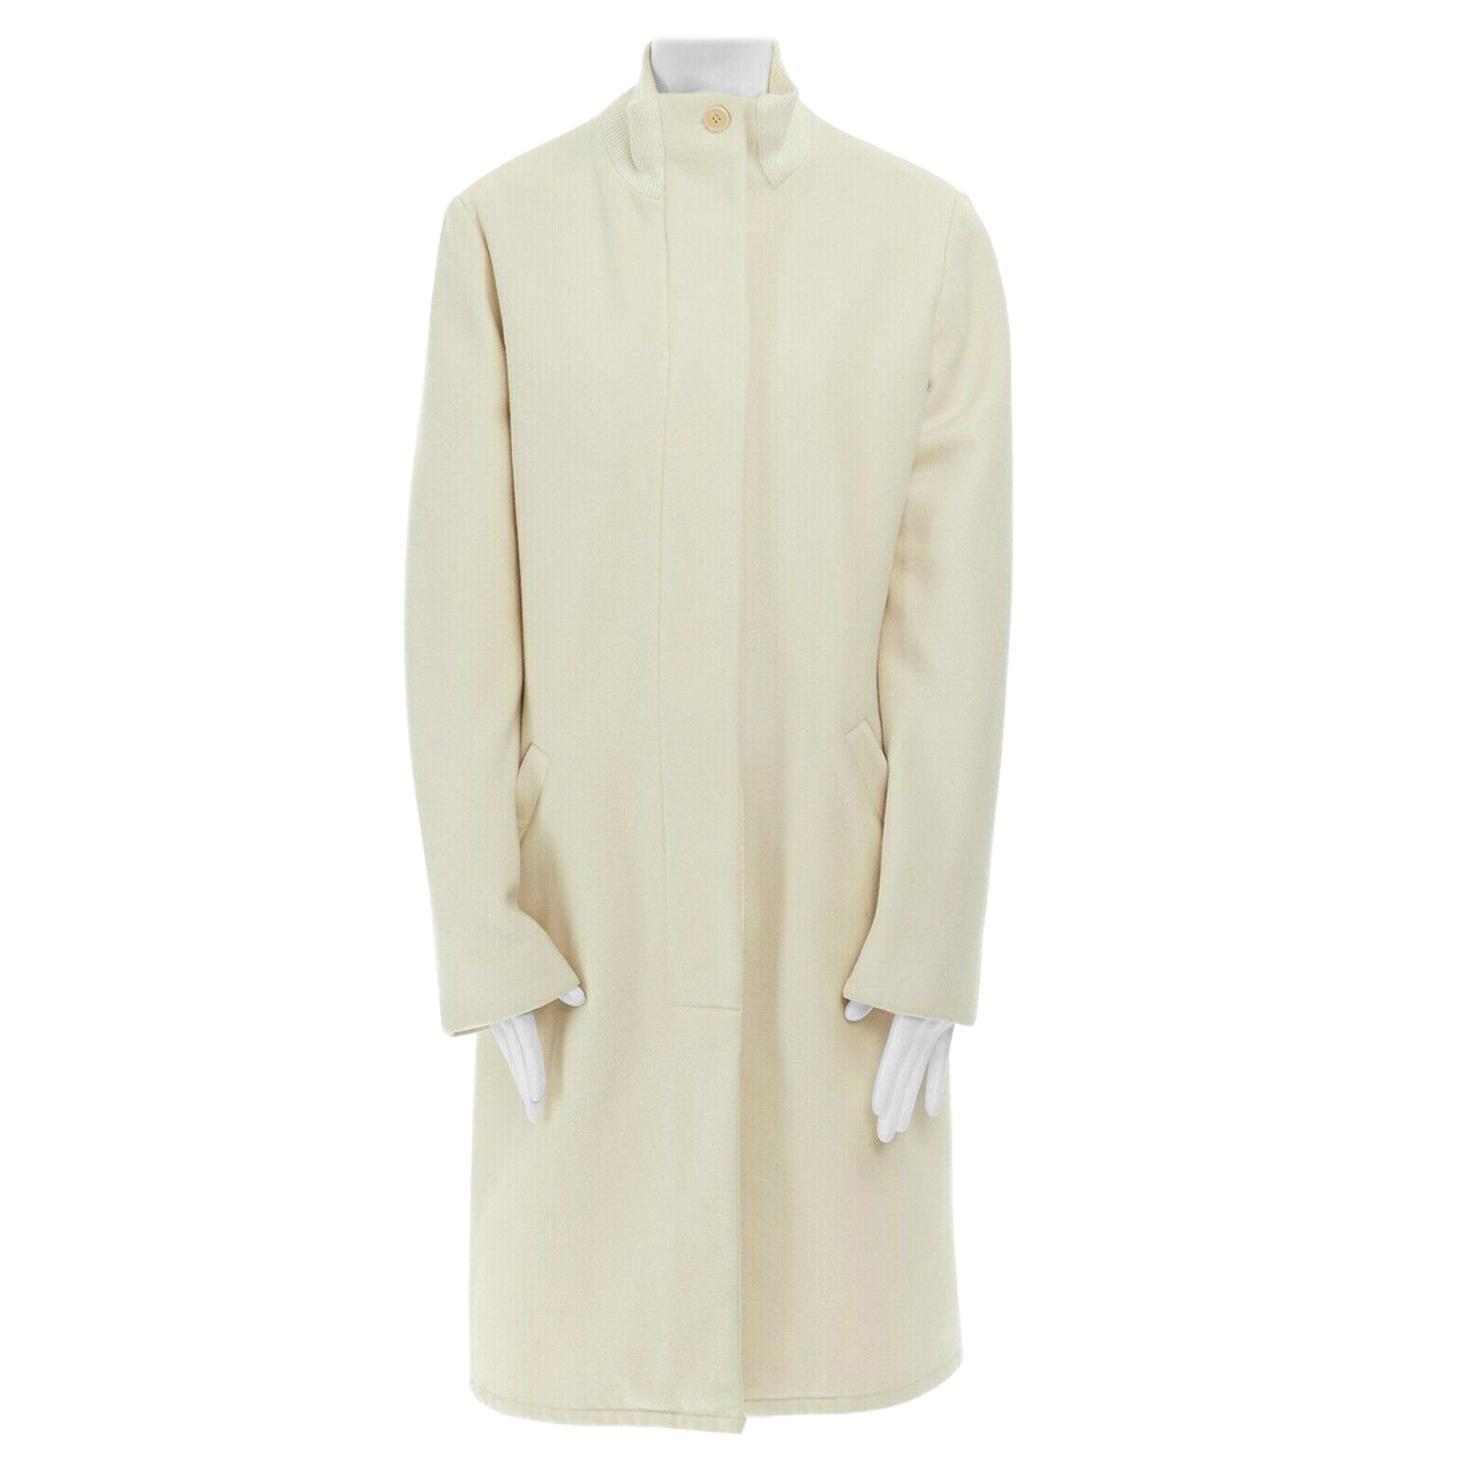 runway HELMUT LANG Vintage AW97 cream bomber collar wool coat jacket IT40 US2 S